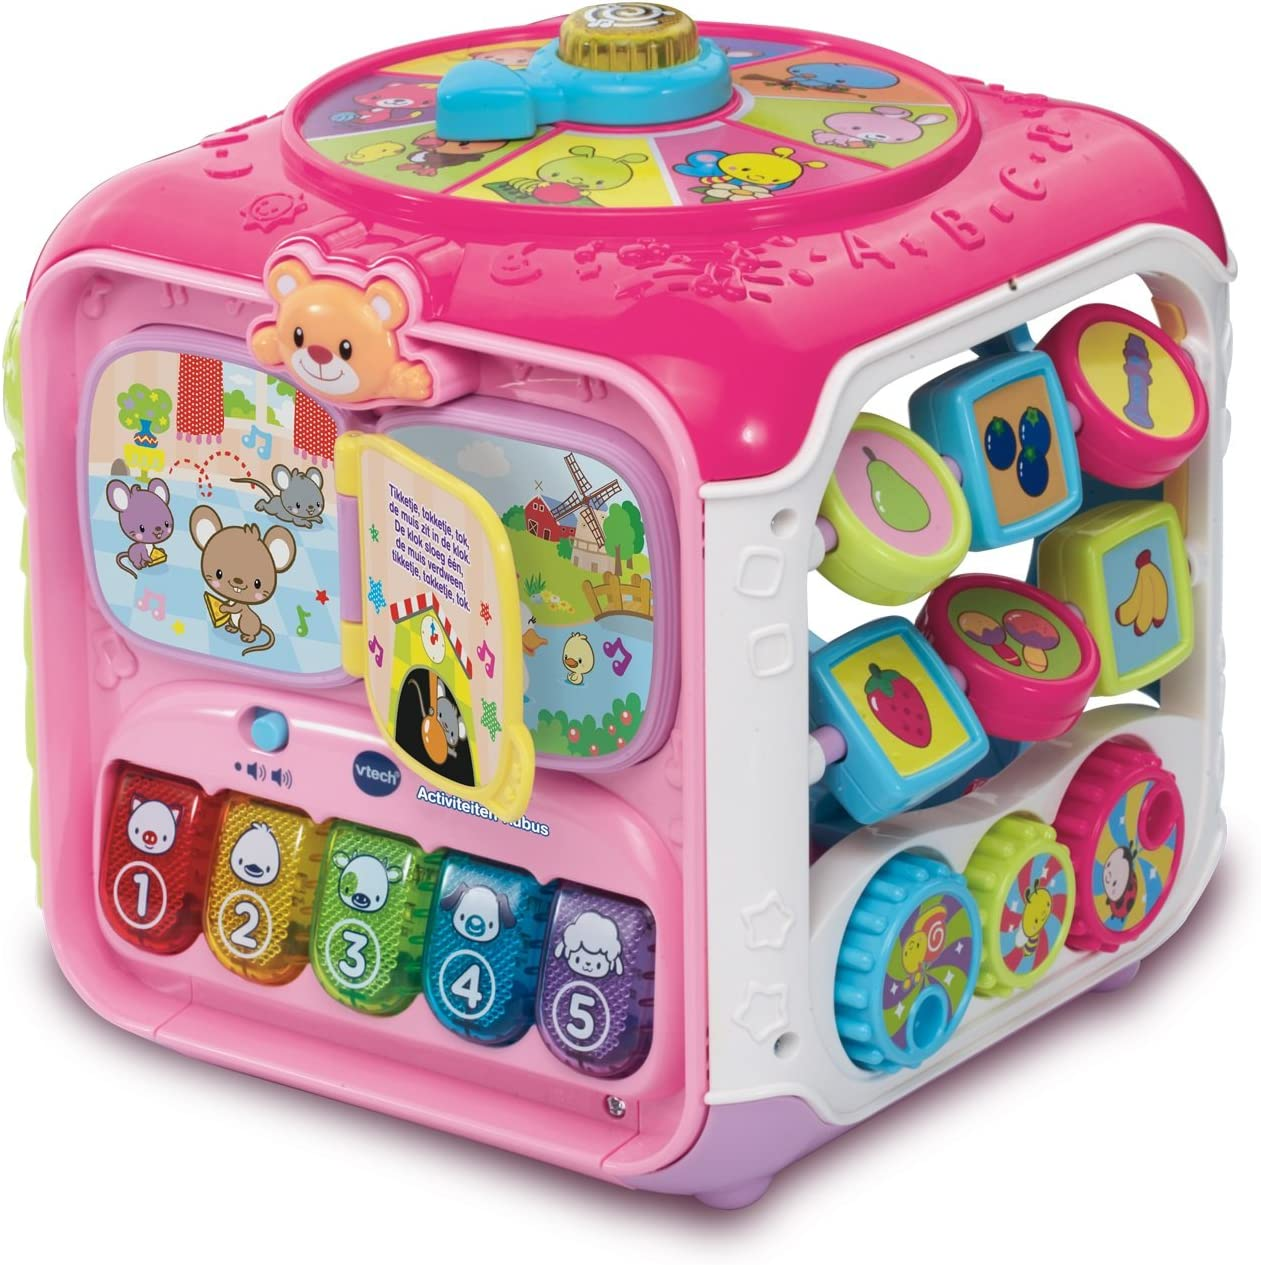 VTech Baby Activiteiten Kubus roze - Juegos educativos (Rosa, Chica, 3 año(s), Holandés, De plástico, CE)